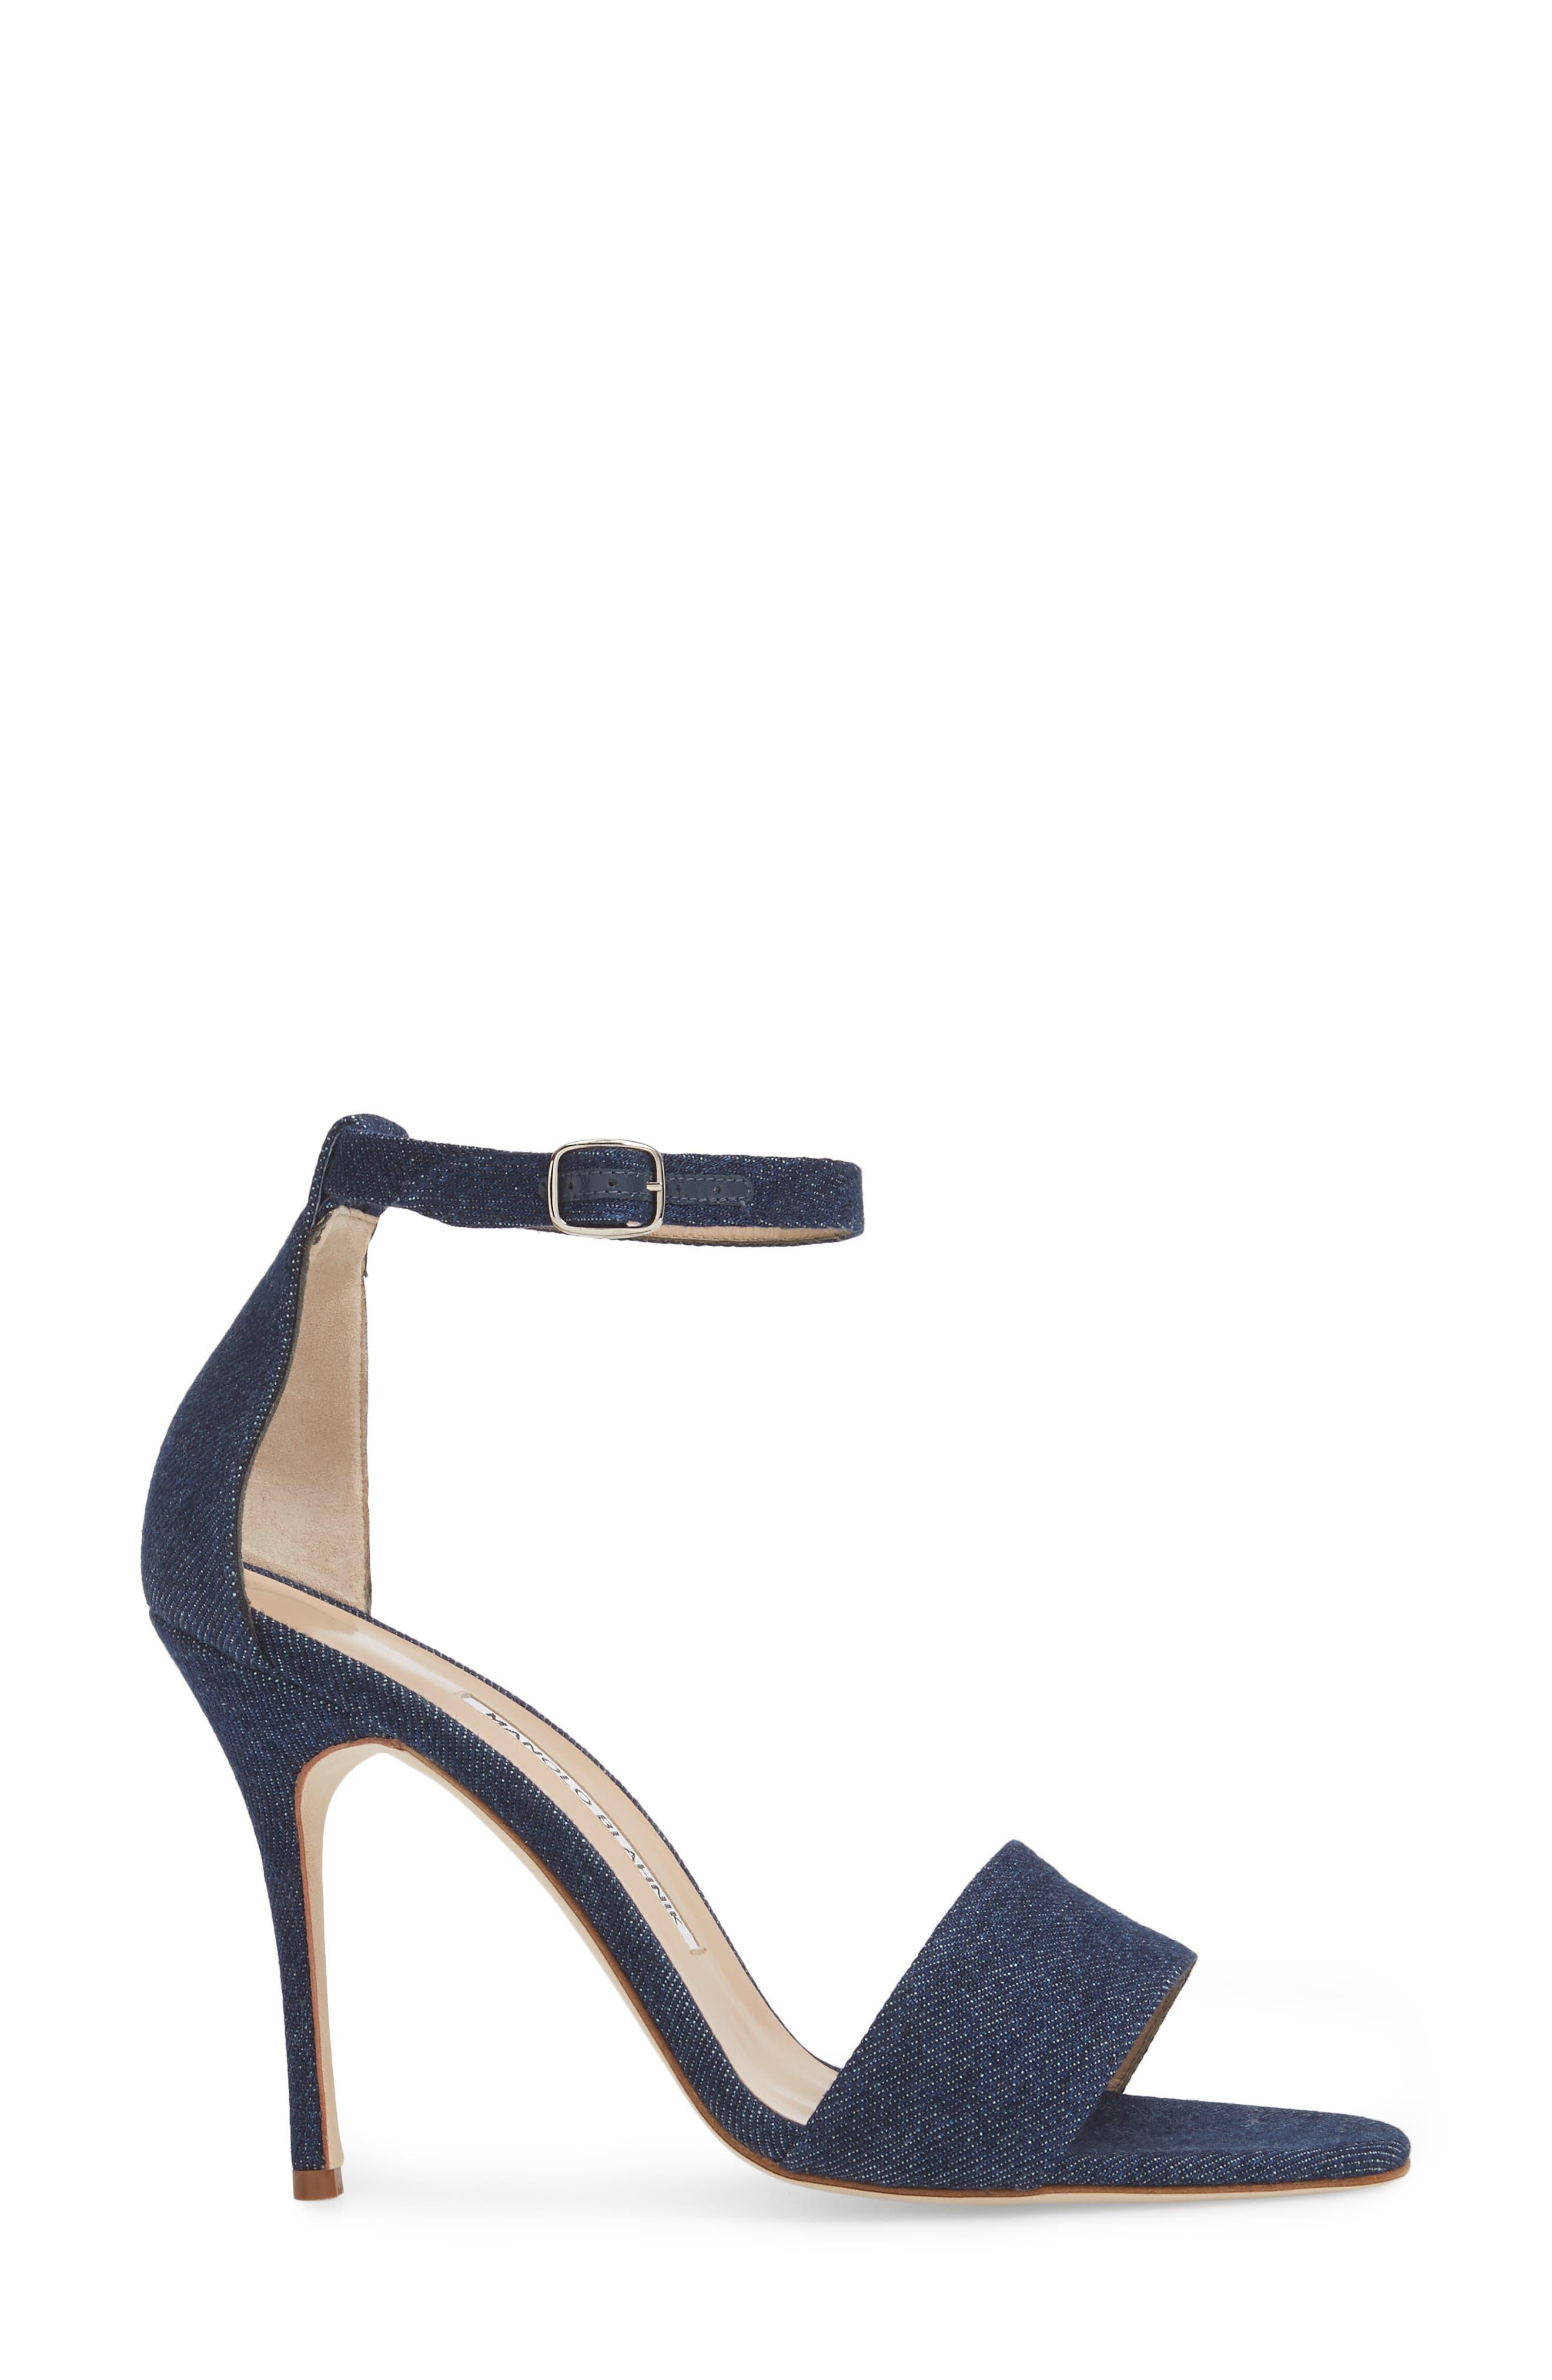 Tres Ankle Strap Sandal,                             Alternate thumbnail 3, color,                             DENIM BLUE